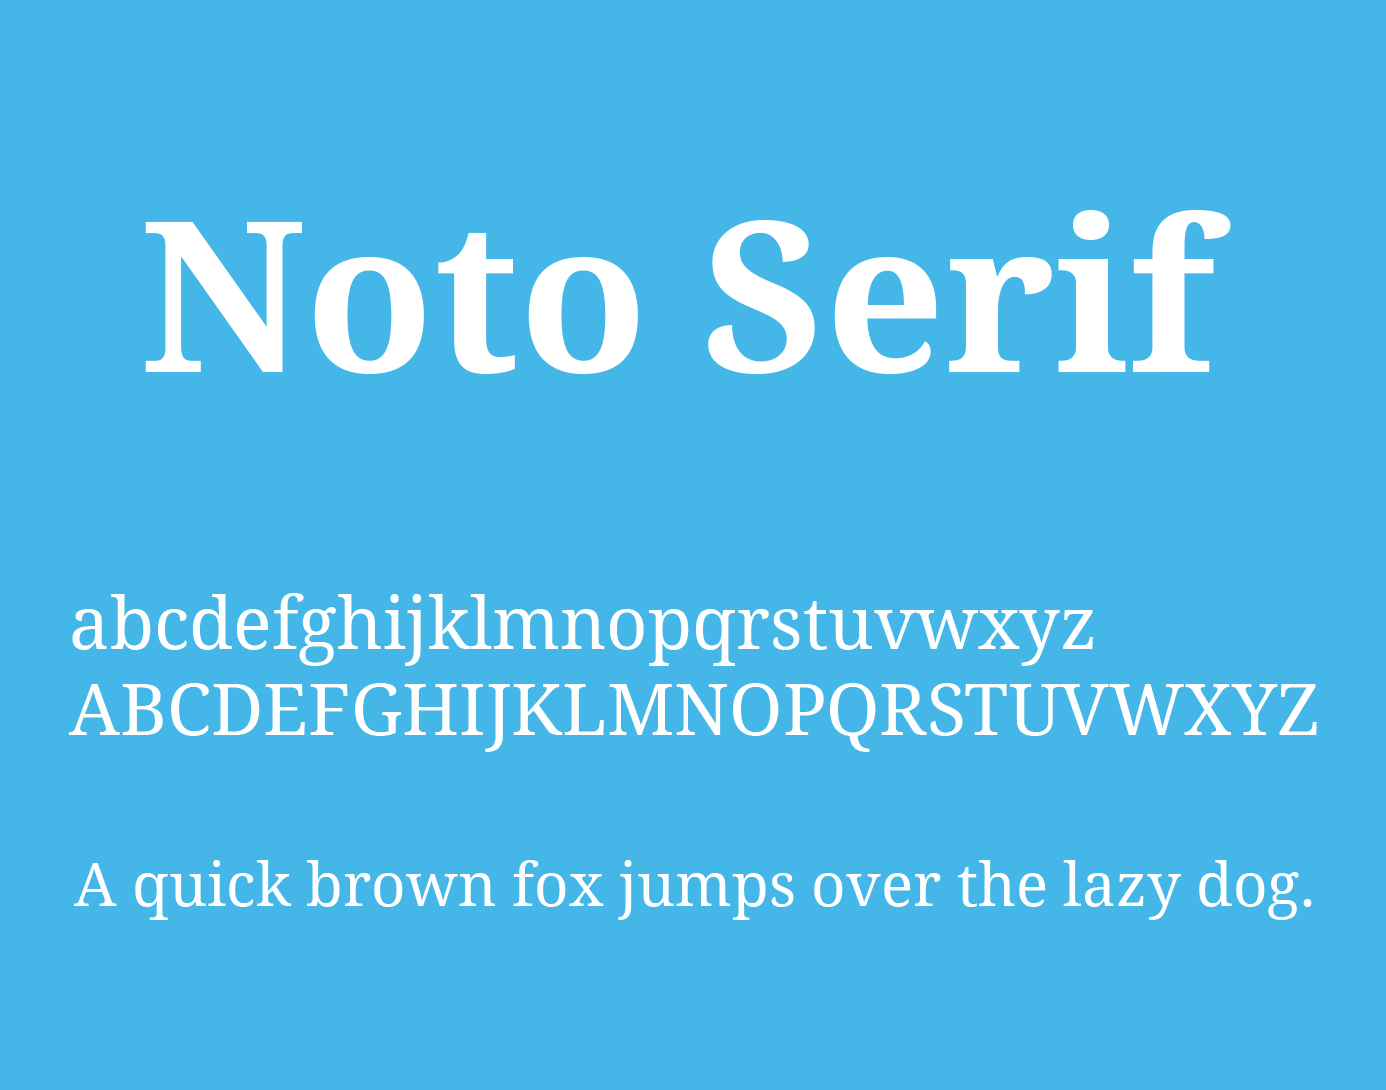 noto-serif-font